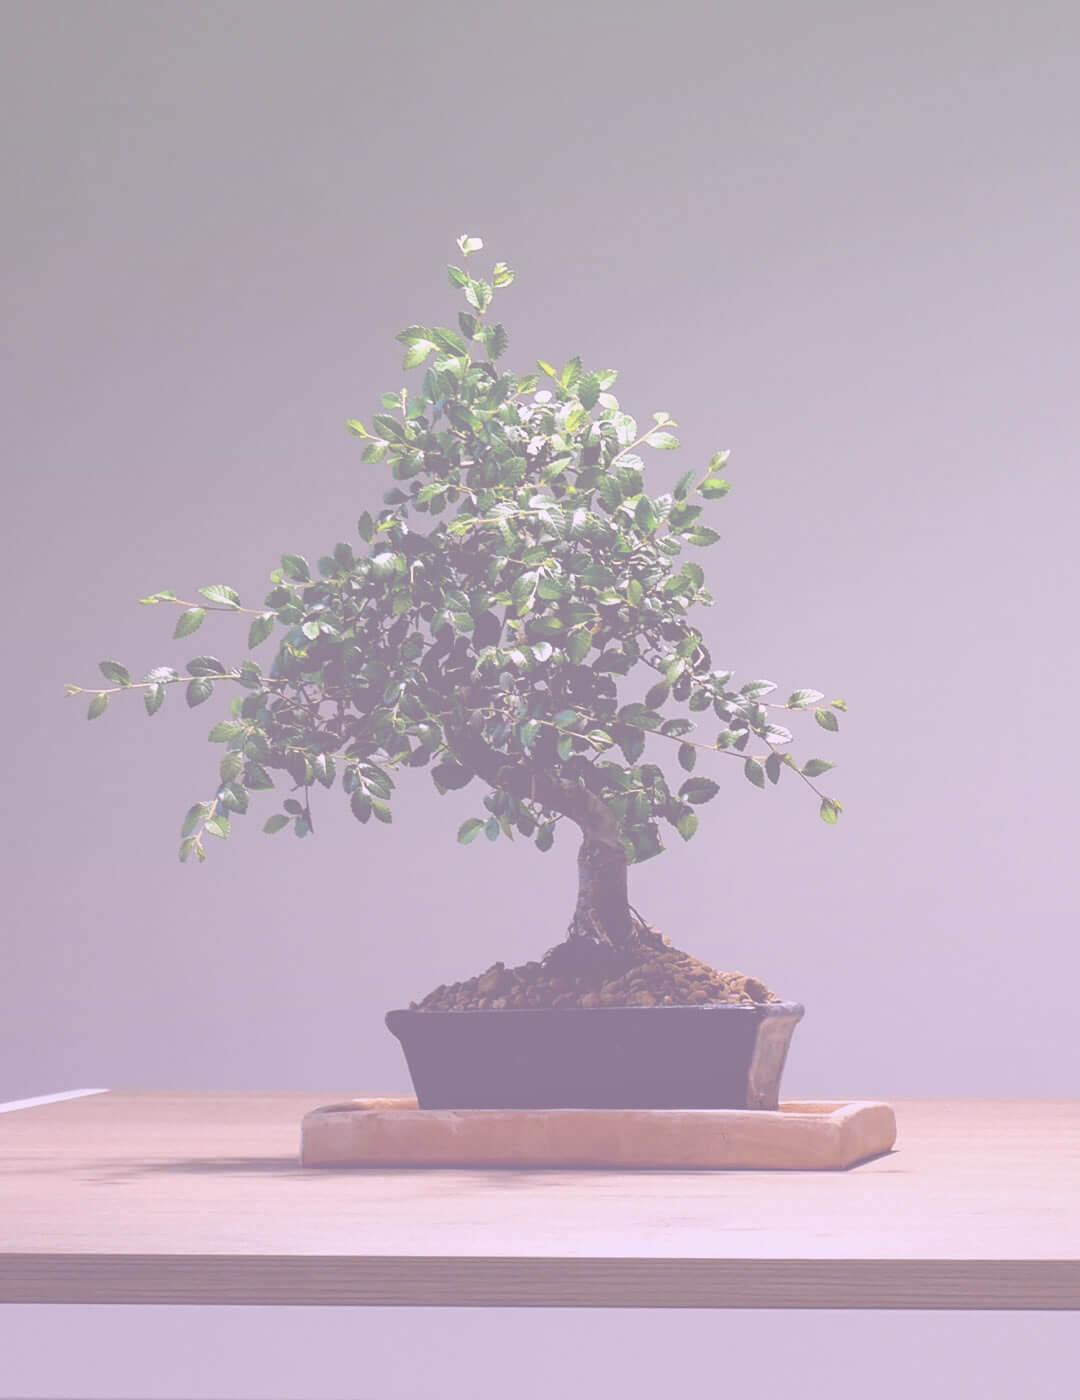 a bonsai tree as a meditation room decor